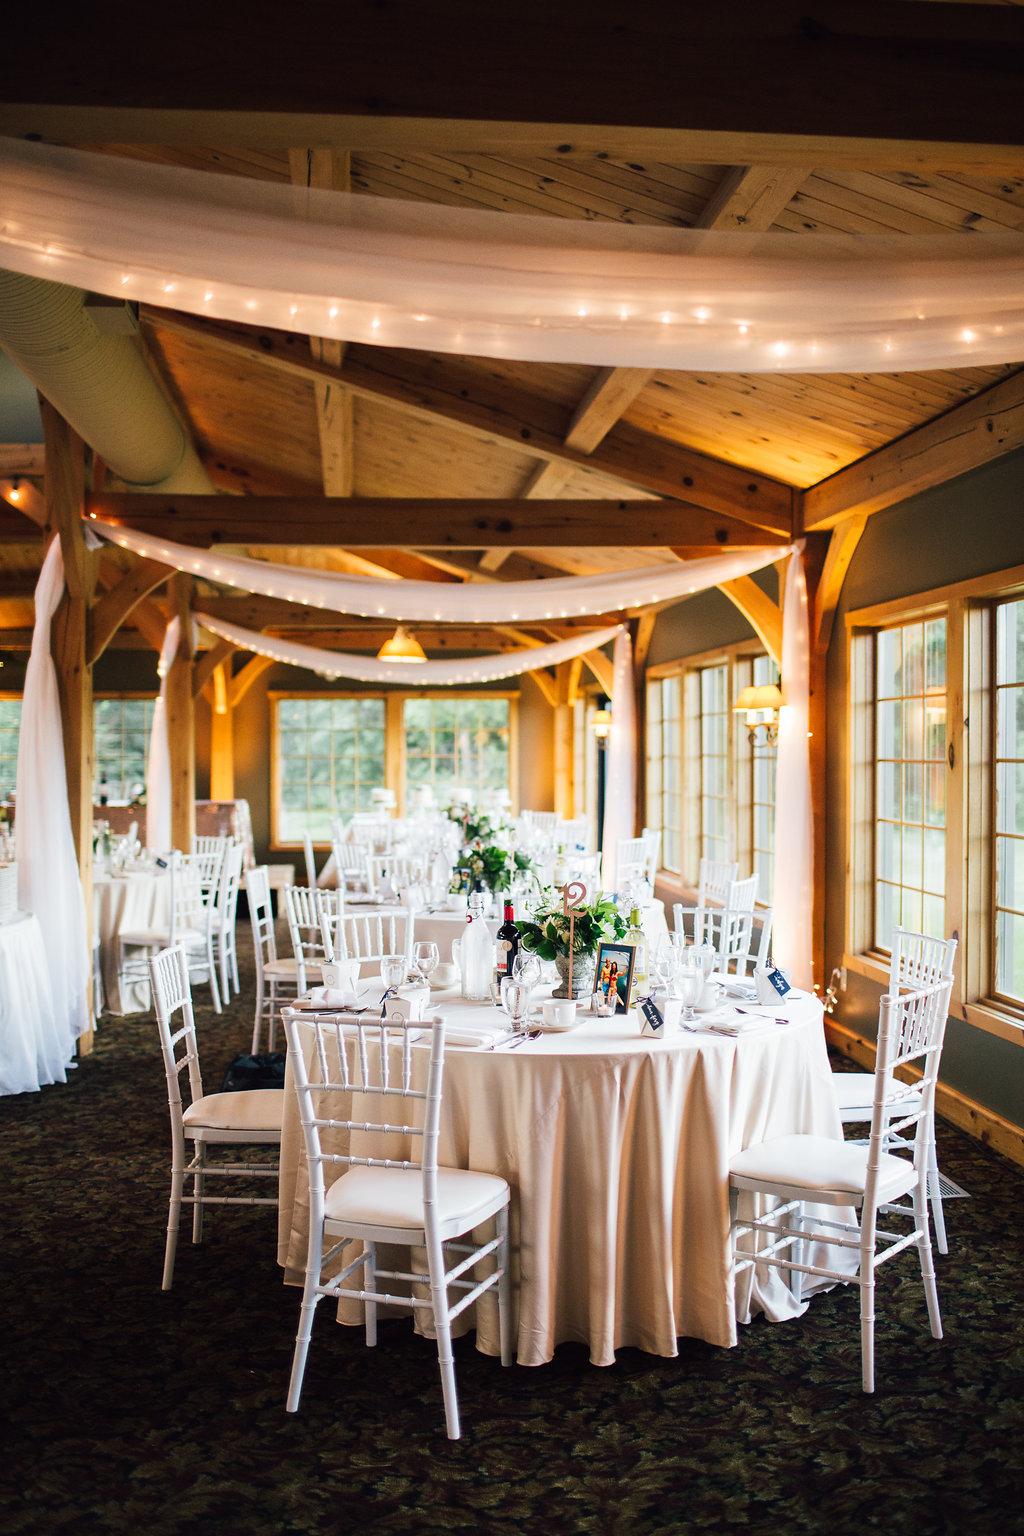 Bridges Golf Course Wedding - Stone House Creative